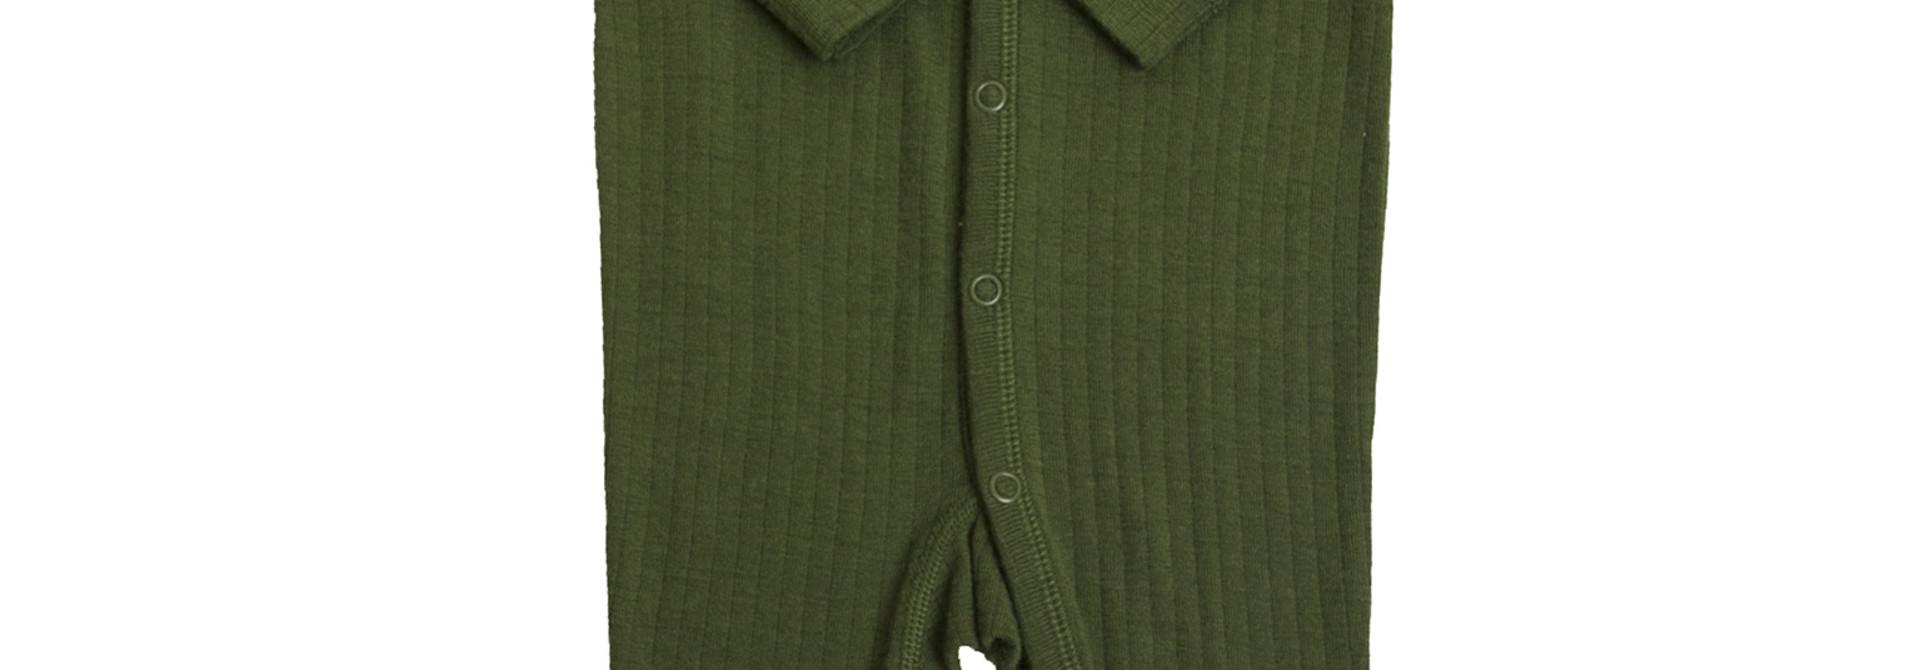 Jumpsuit - merino wool